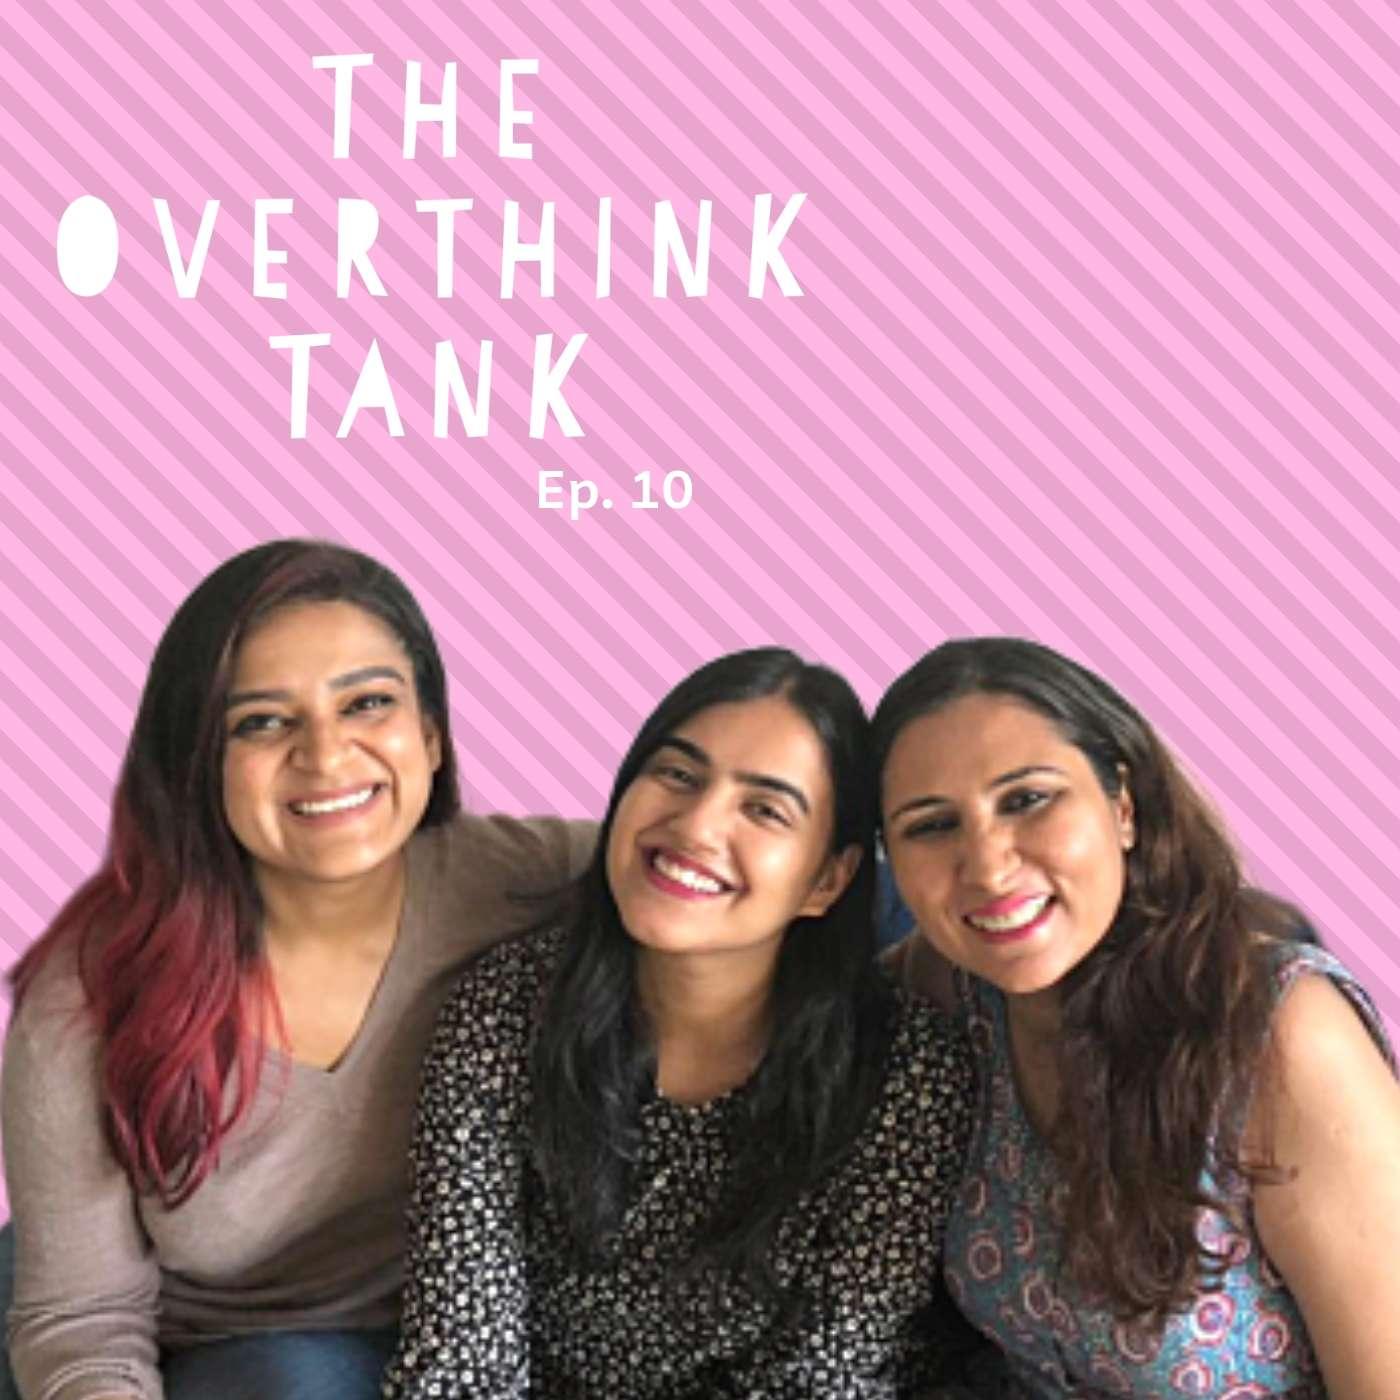 Ep. 10: How To Handle Heartbreak feat. Kaneez Surka and Sonali Gupta